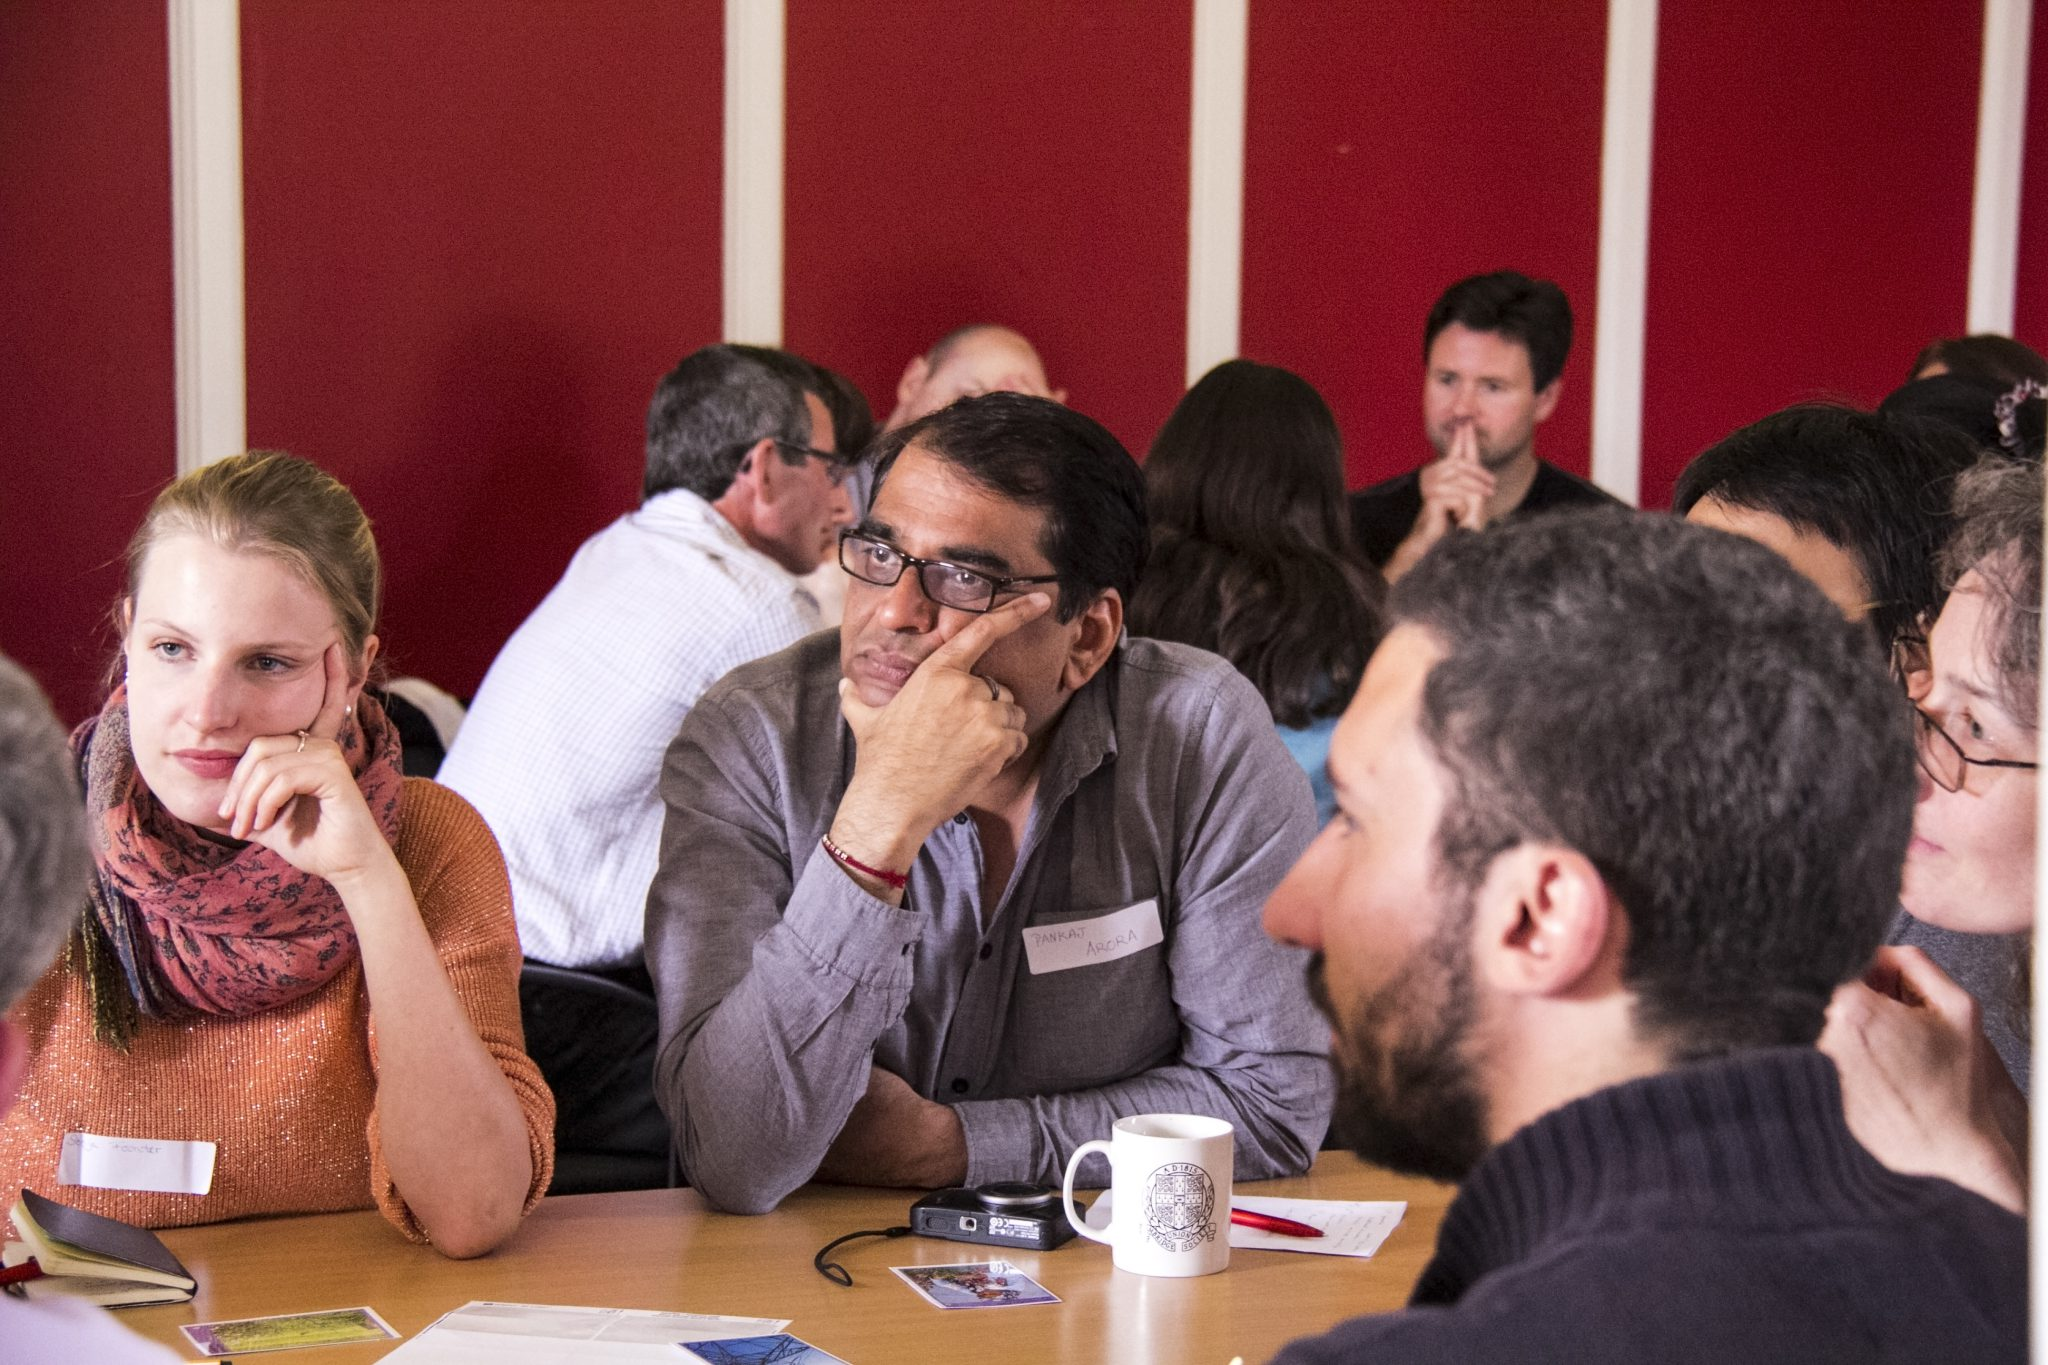 Participants in a public dialogue exercise